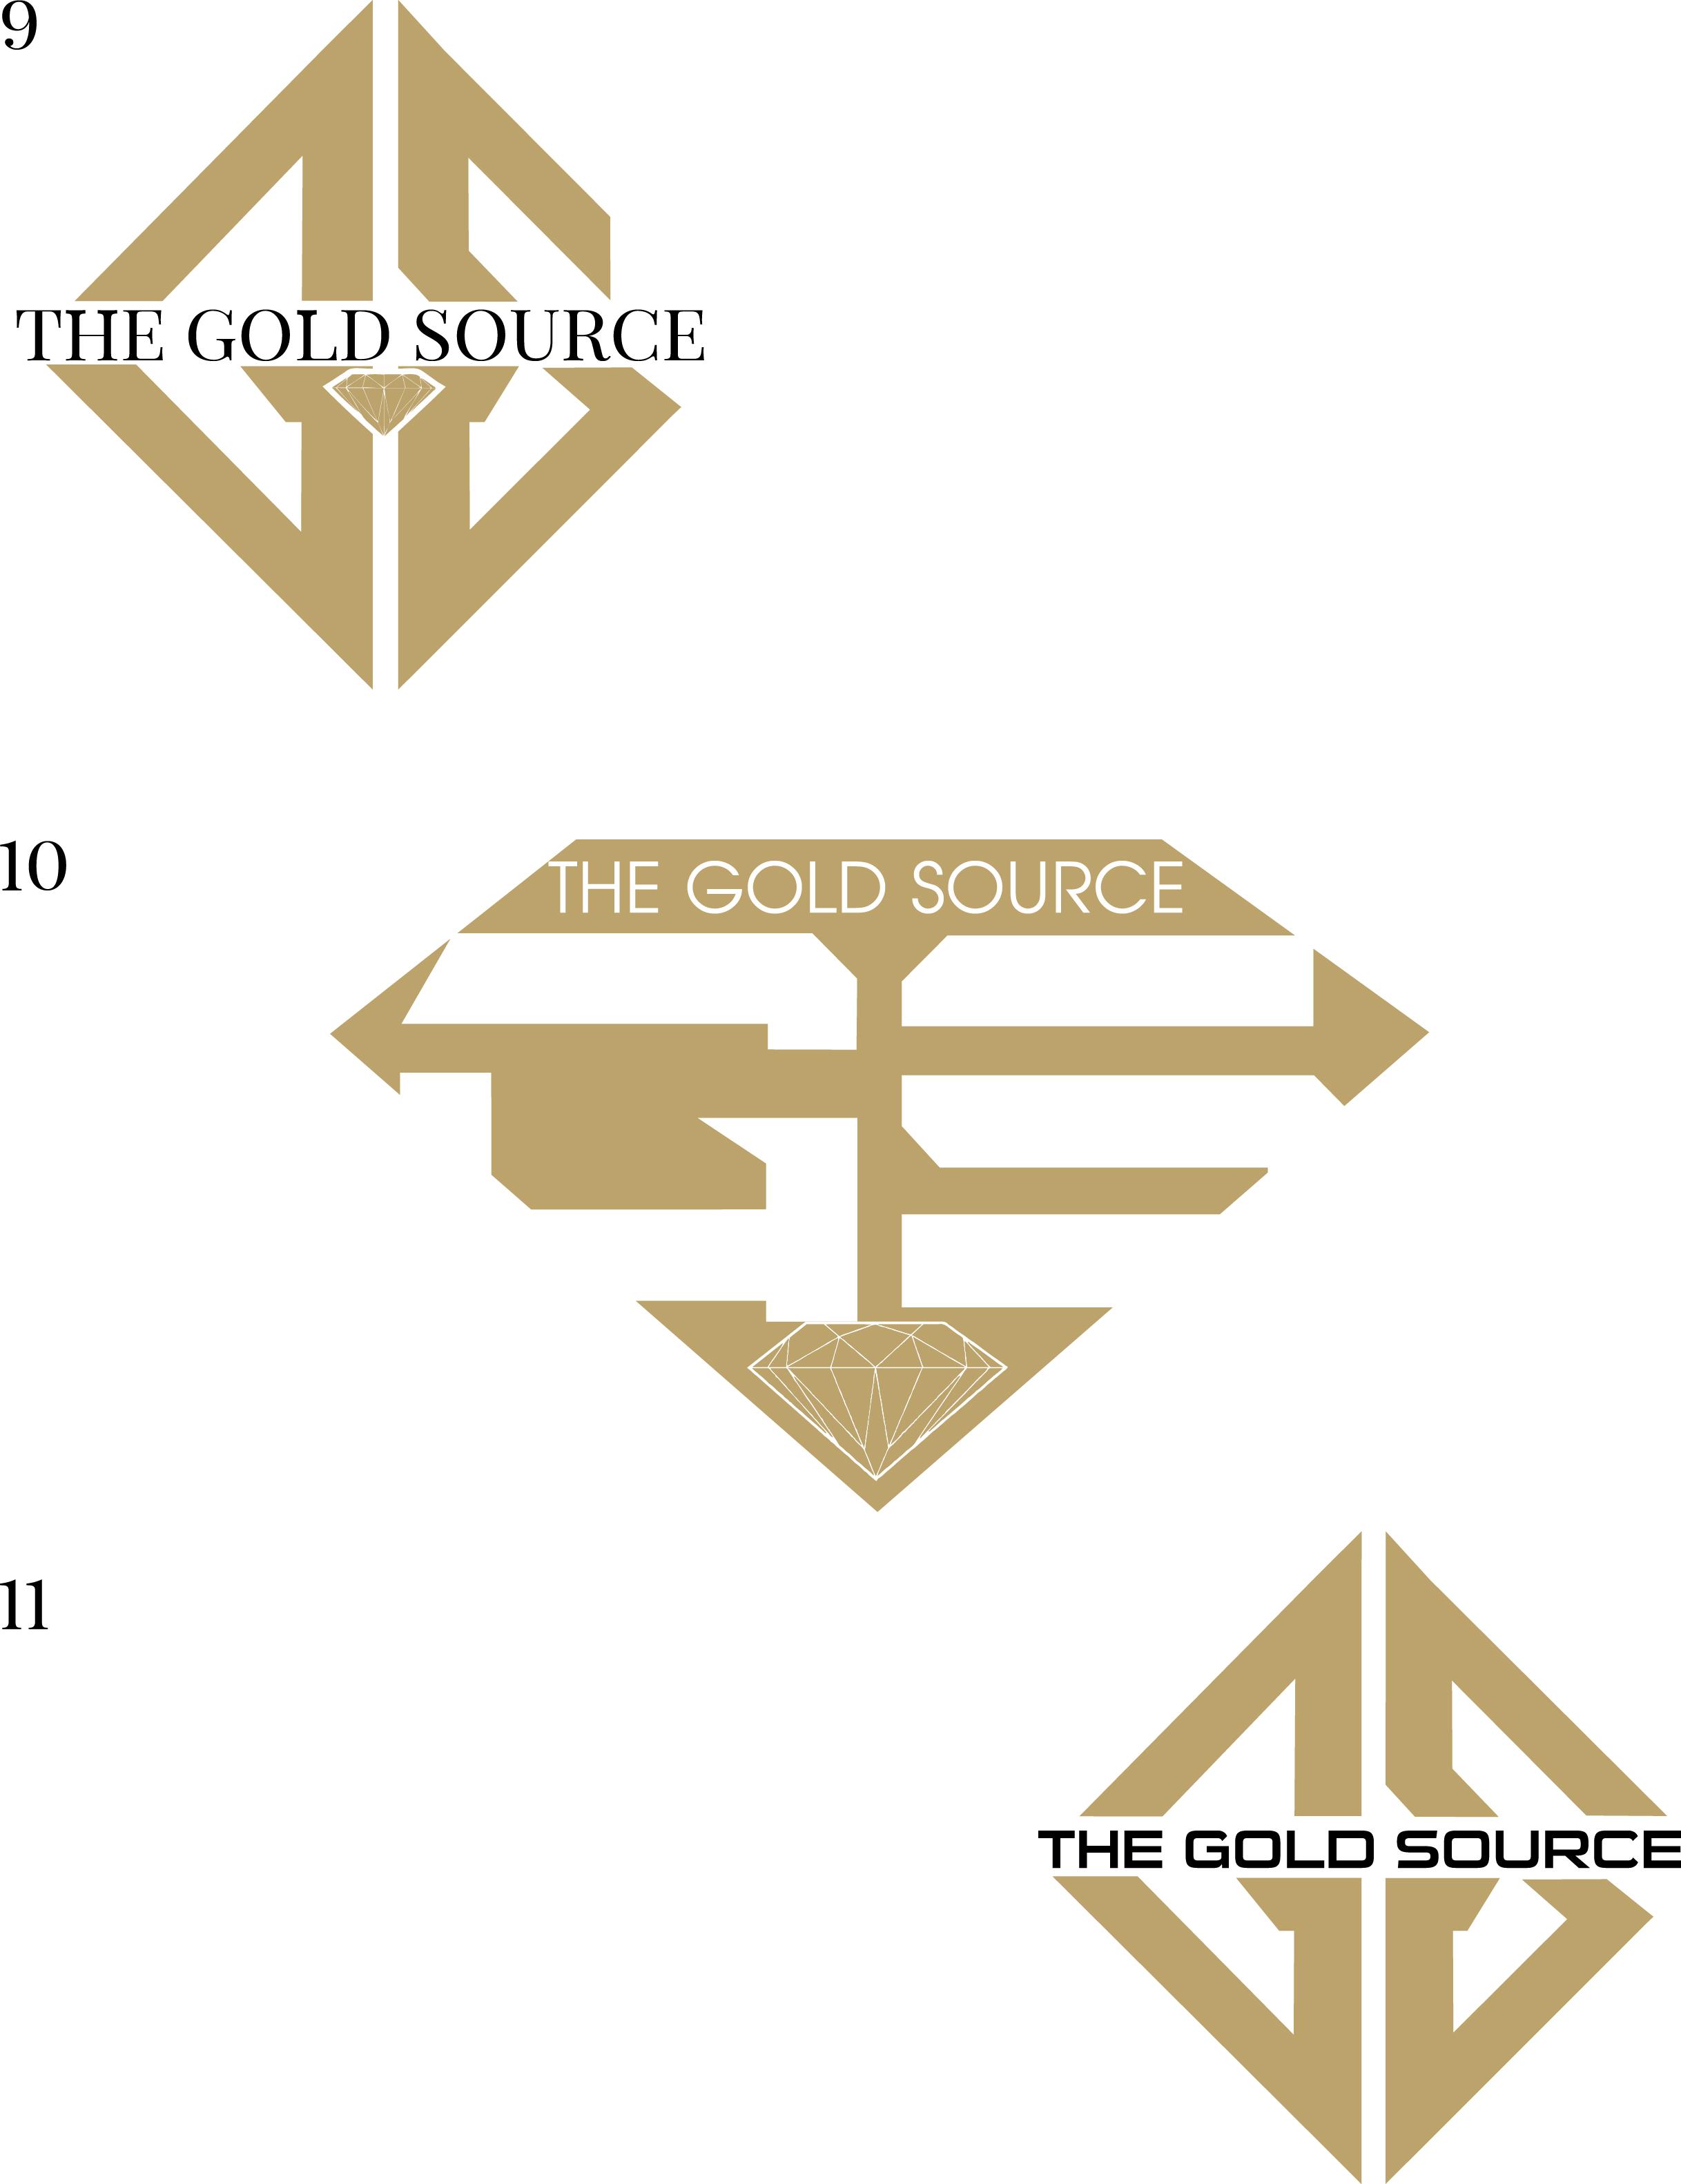 TheGoldSourceLogo3.jpg